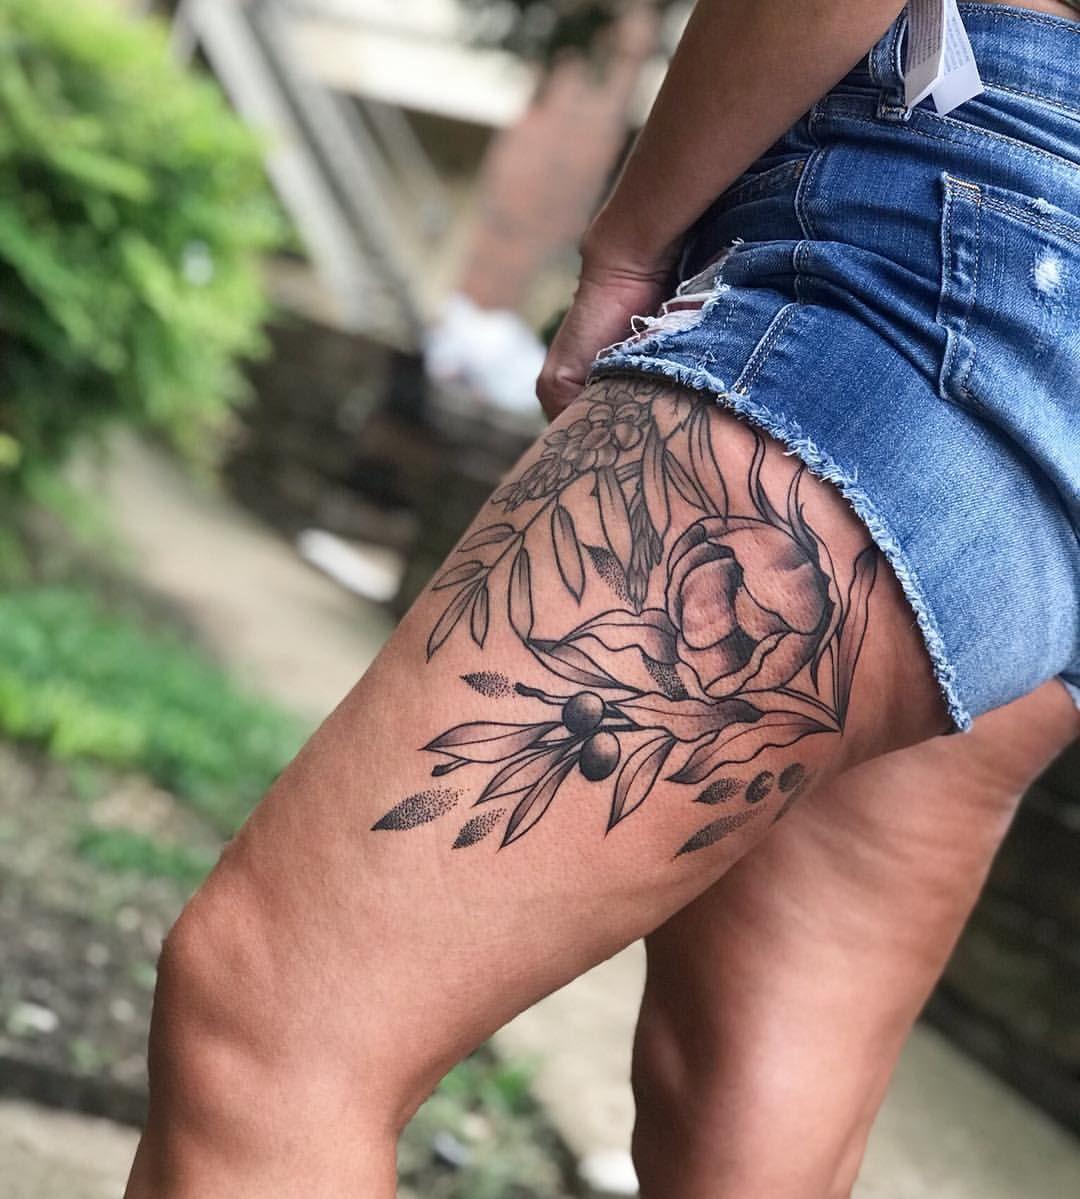 Pin On New Tattoos 2019